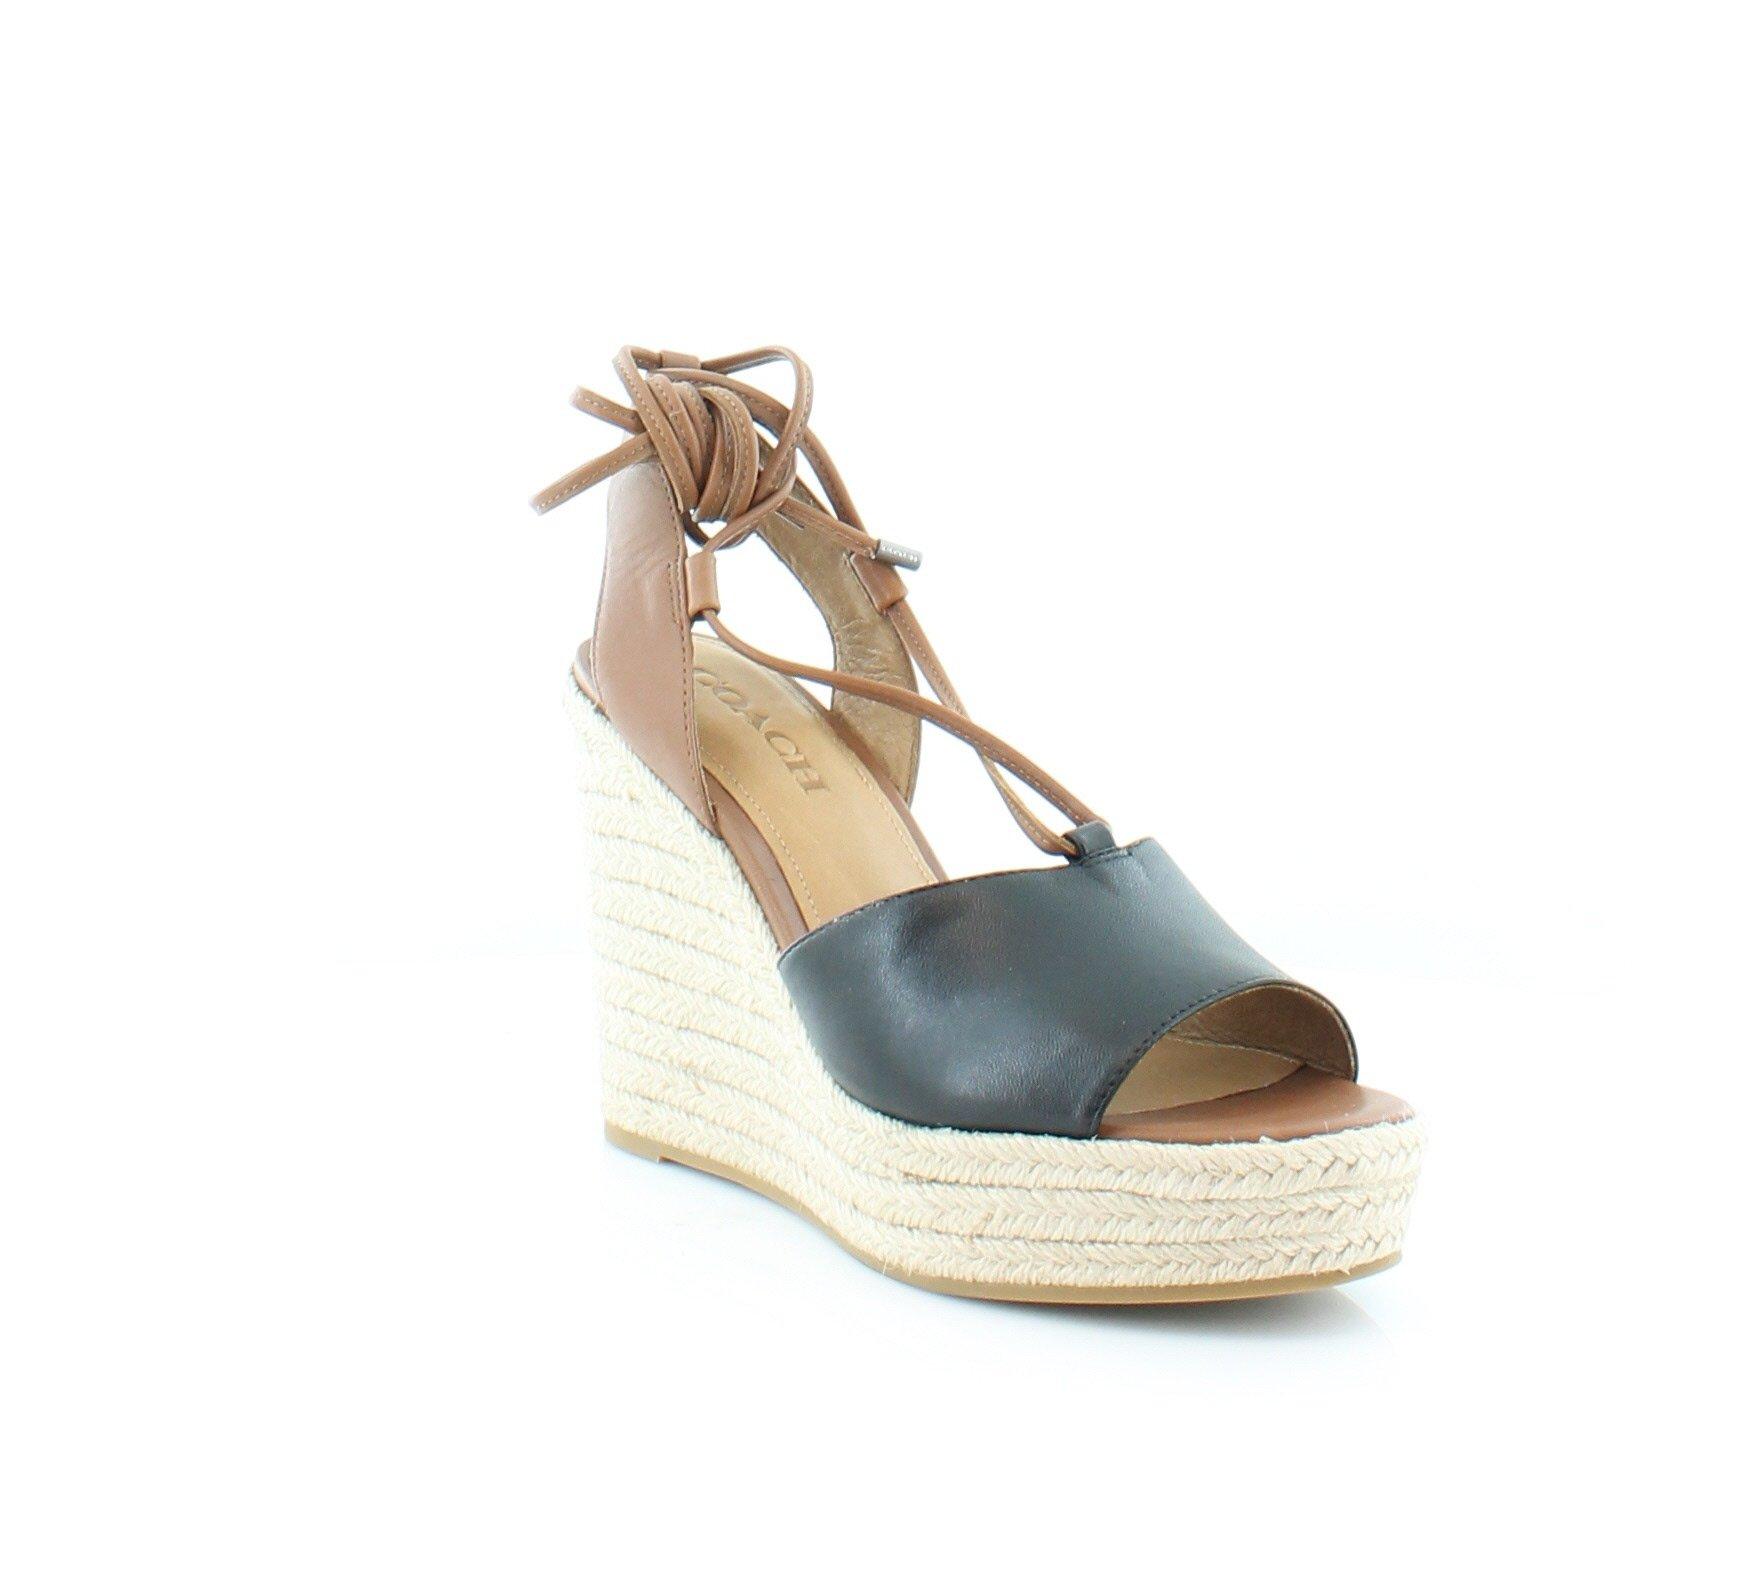 Coach Dana Women's Heels Black/Saddle Size 8 M